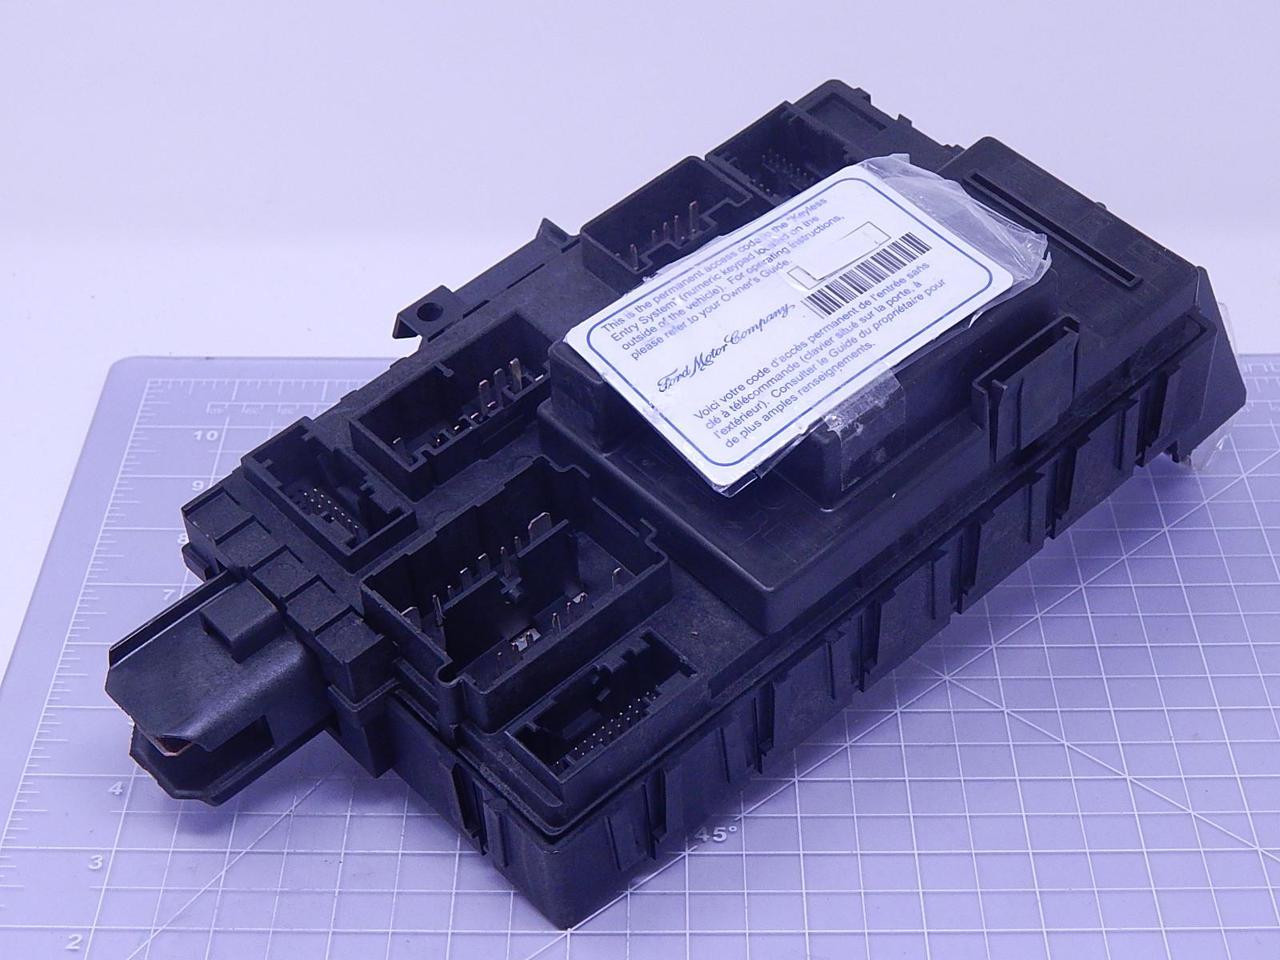 fomoco b000els0qb fuse box t109503 for sale